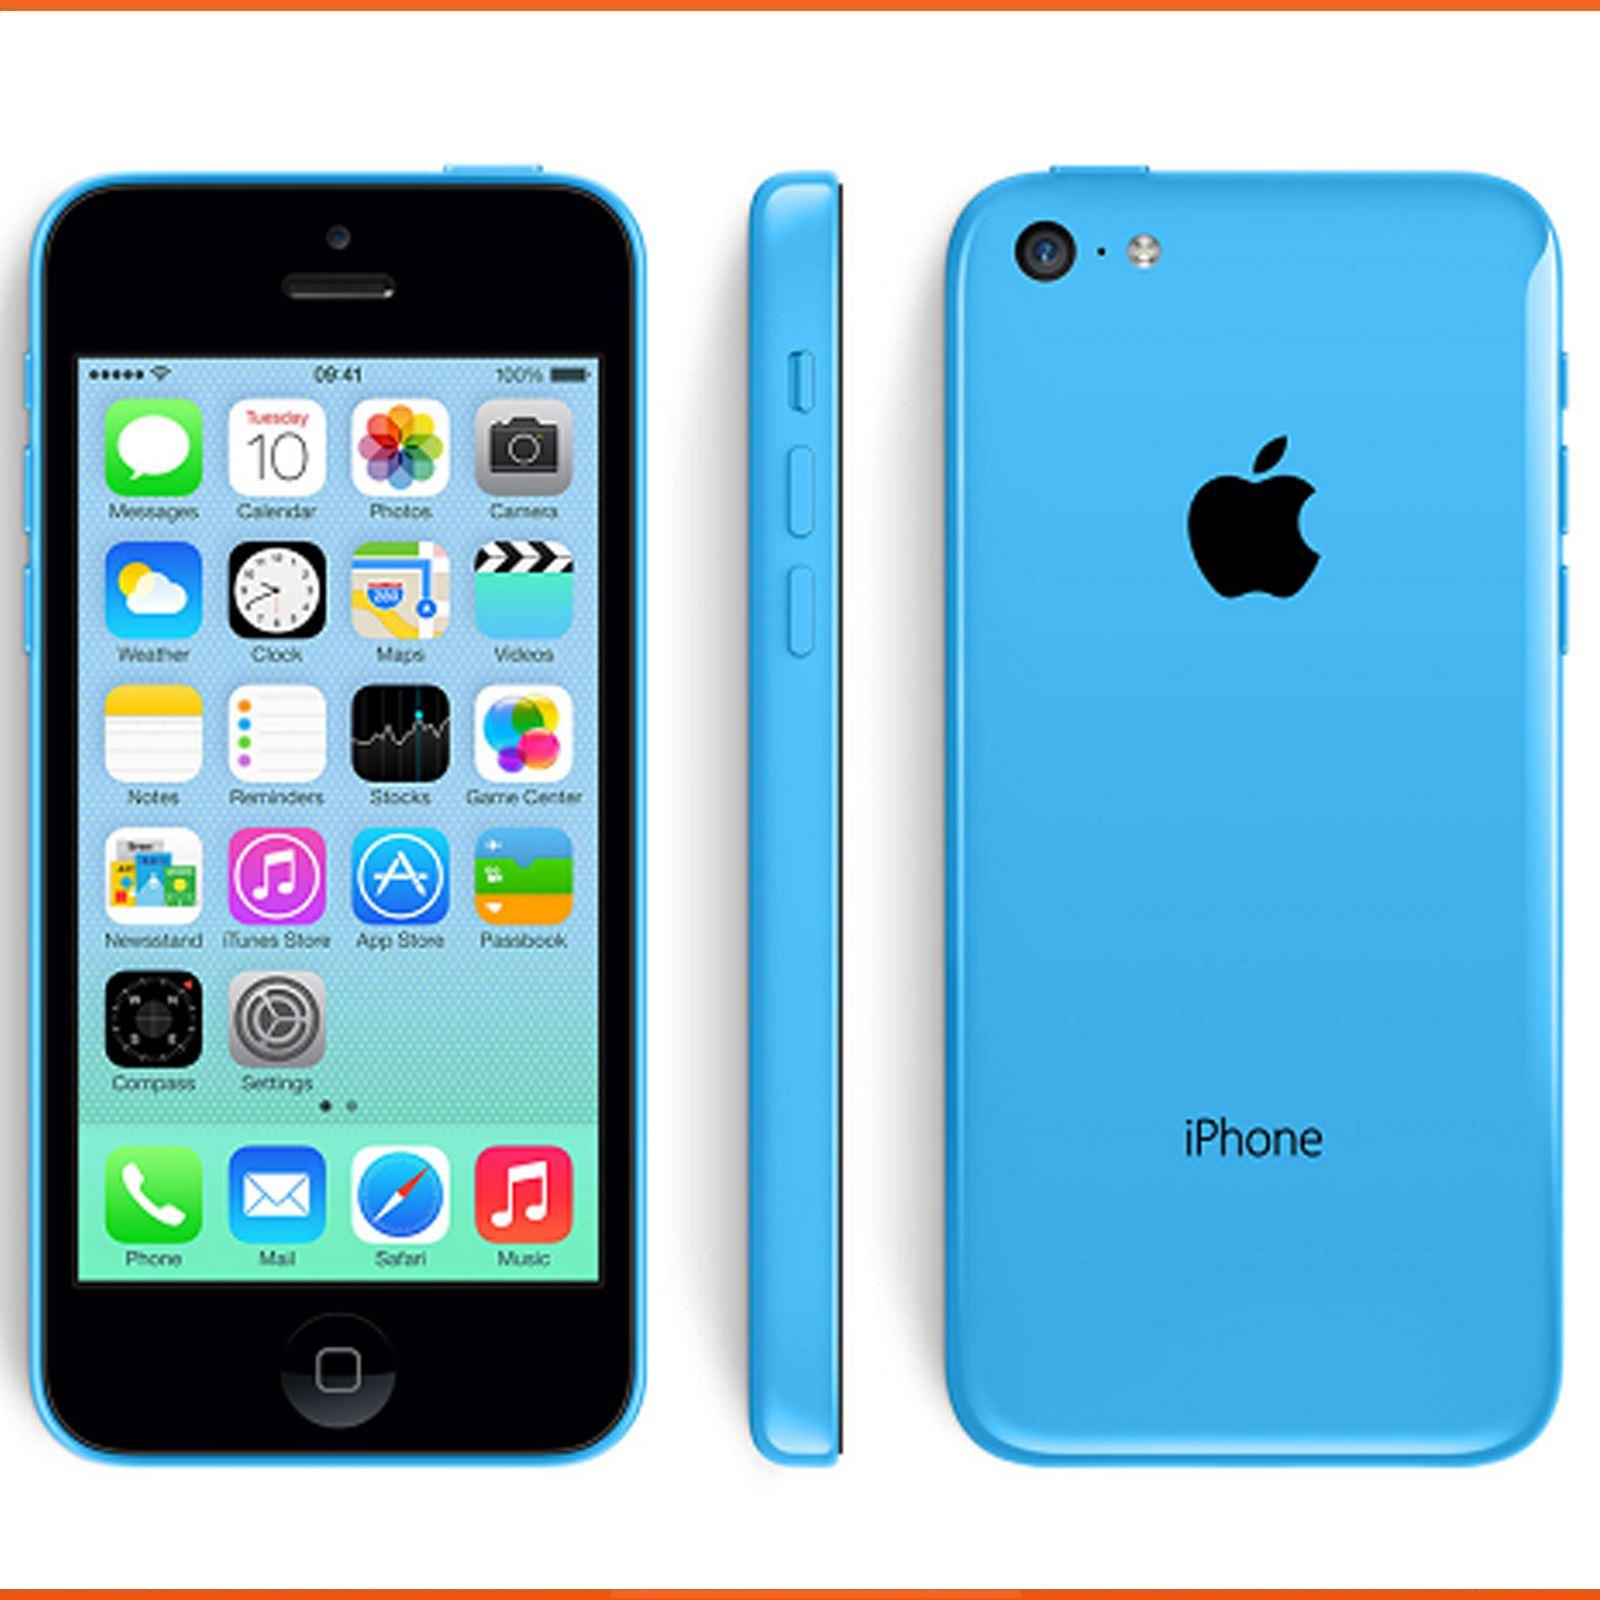 Apple-iPhone-5C-8gb-16gb-32gb-Blue-Green-White-Yellow-Green-Unlocked-Smartphone